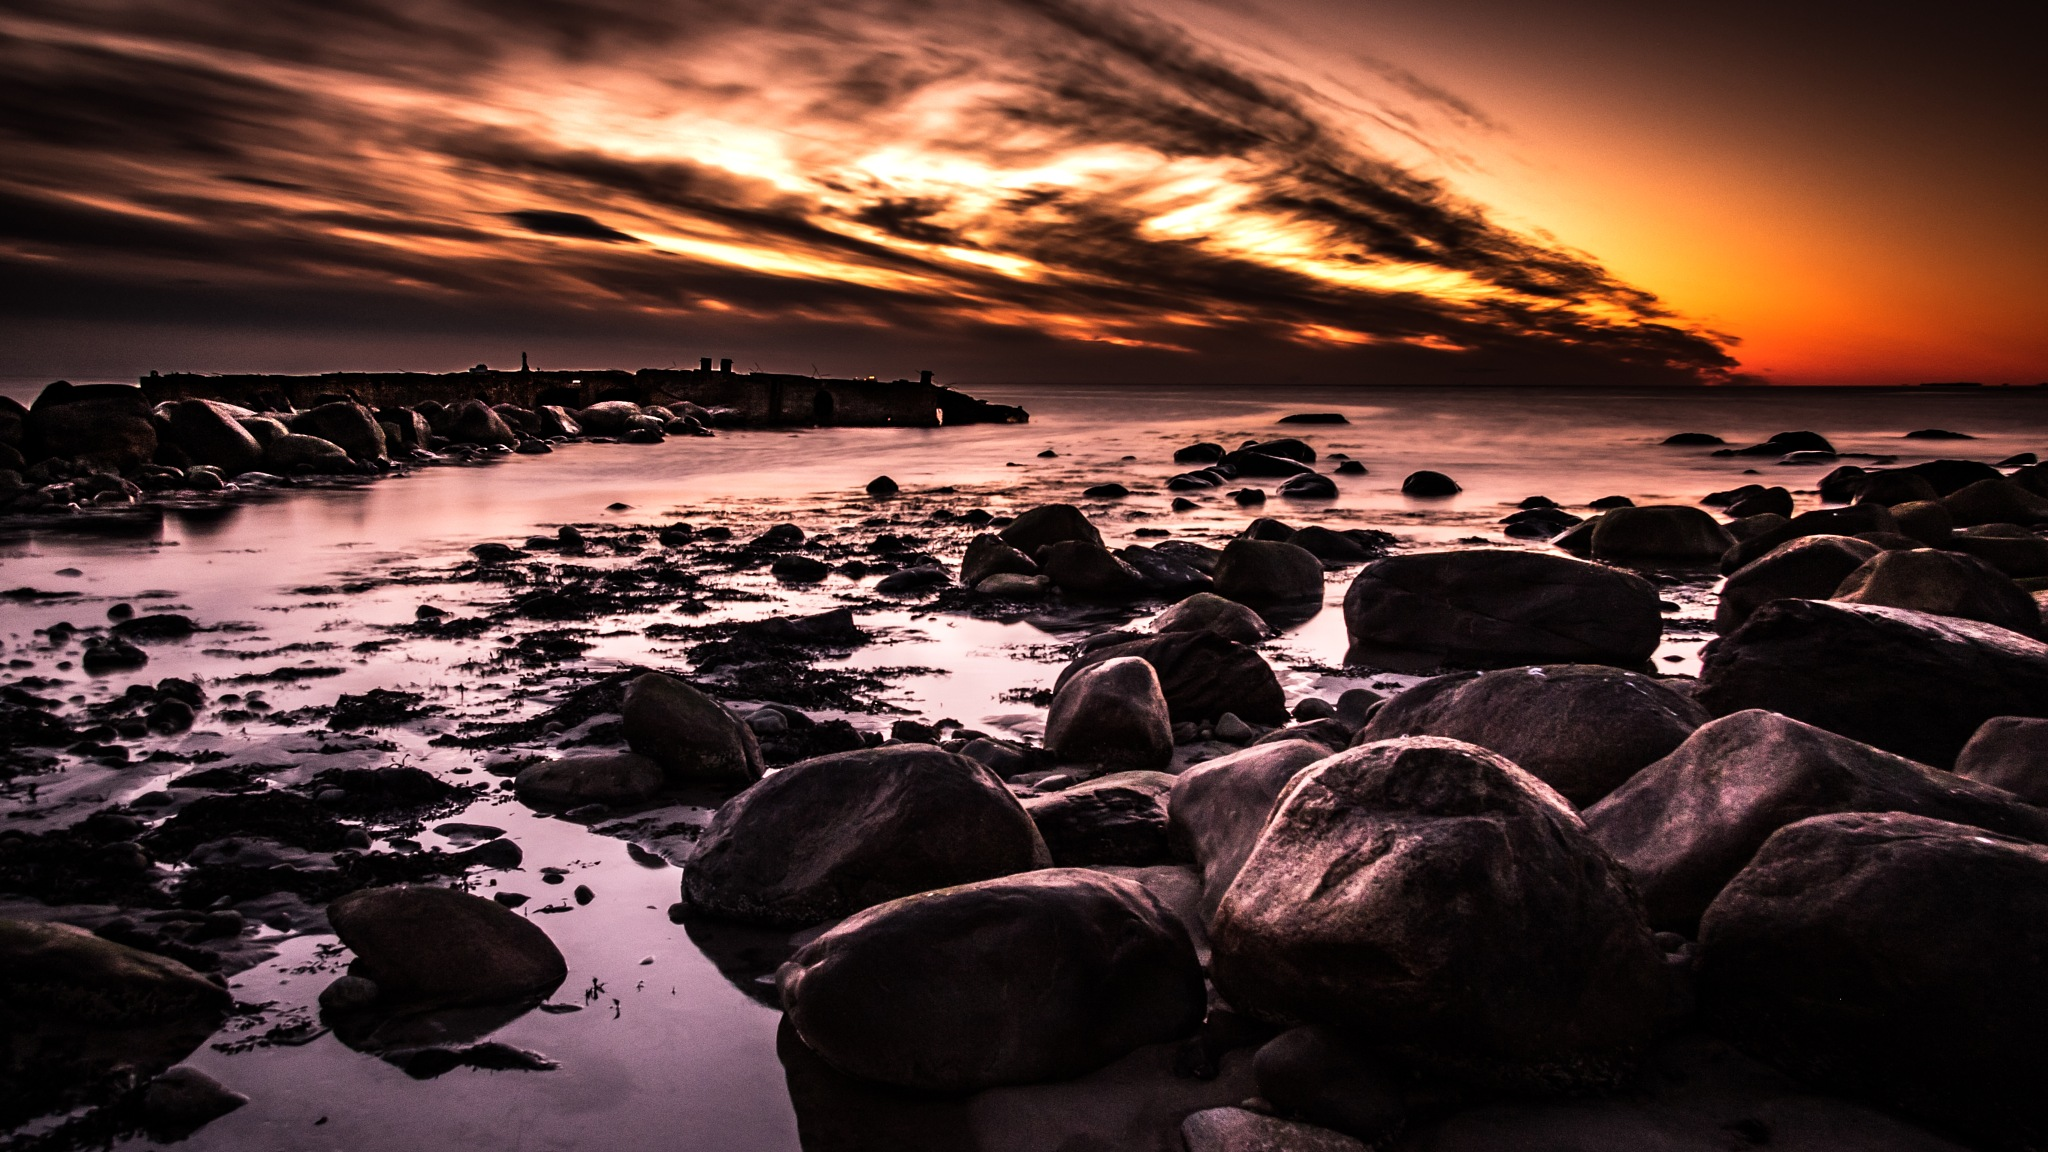 A sundown in paradise  by Jakob Sigurðarson